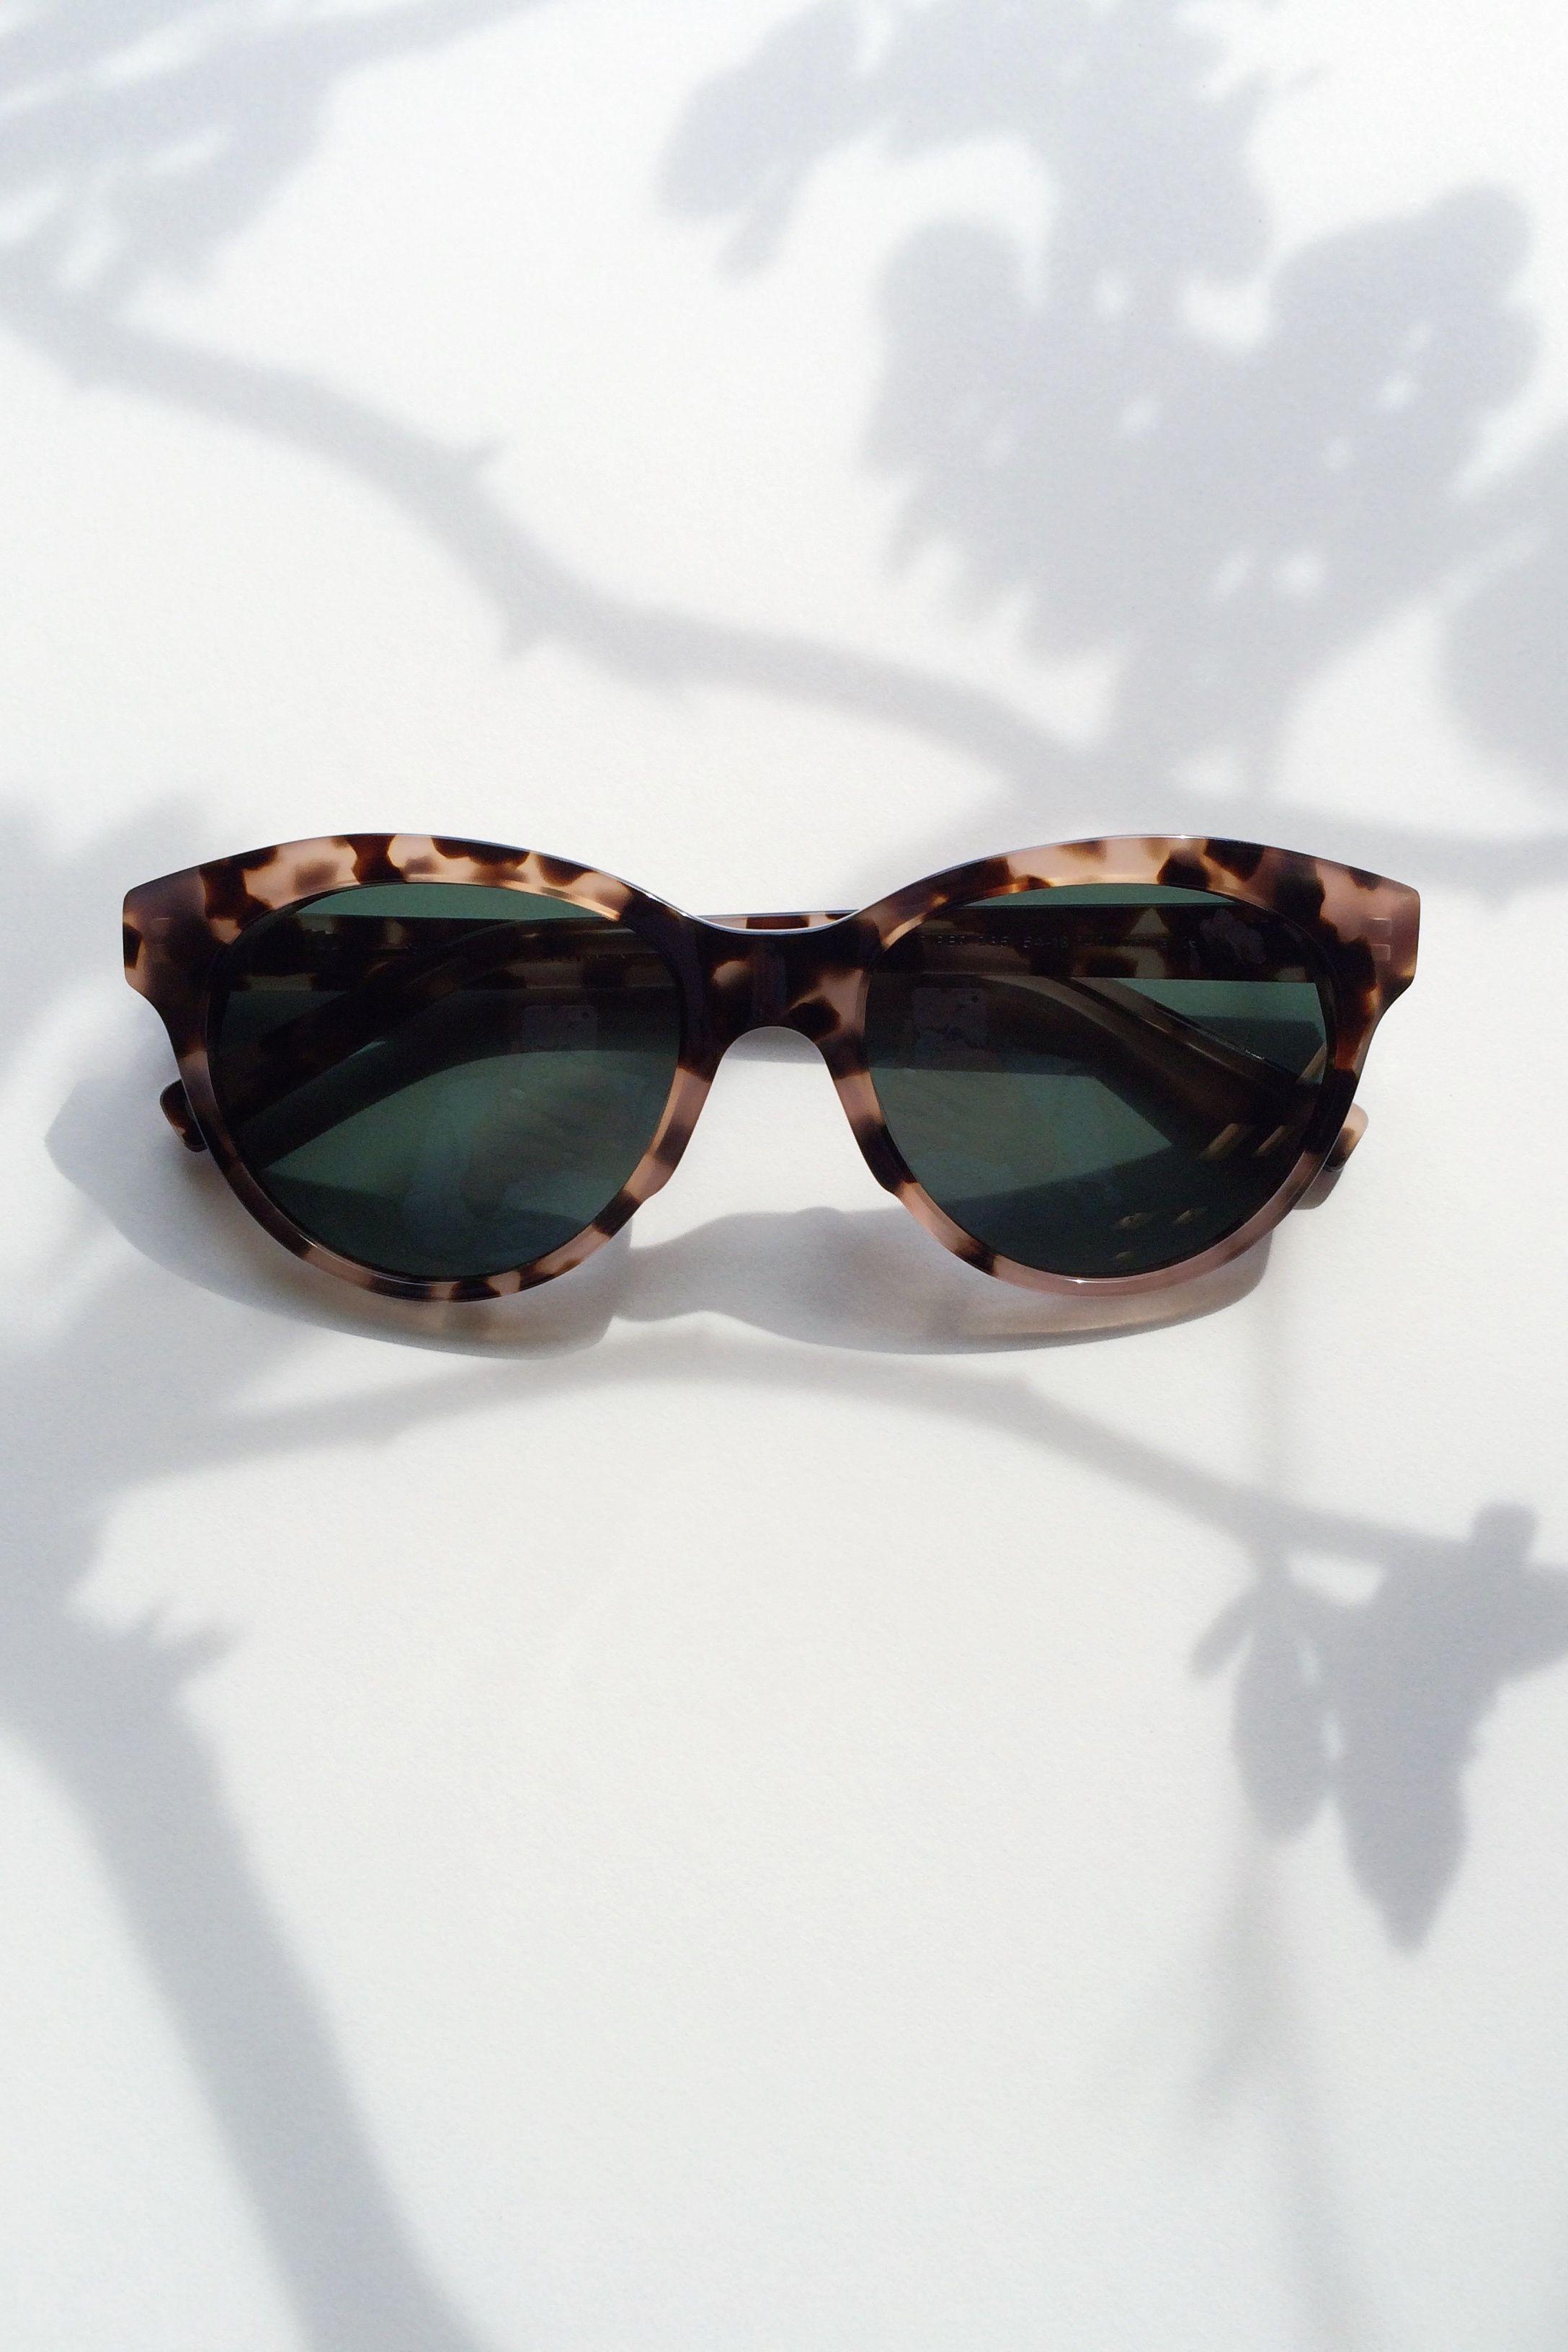 ba1ef34530 Piper sunglasses in Petal Tortoise  http   warby.me KTvMO Ray